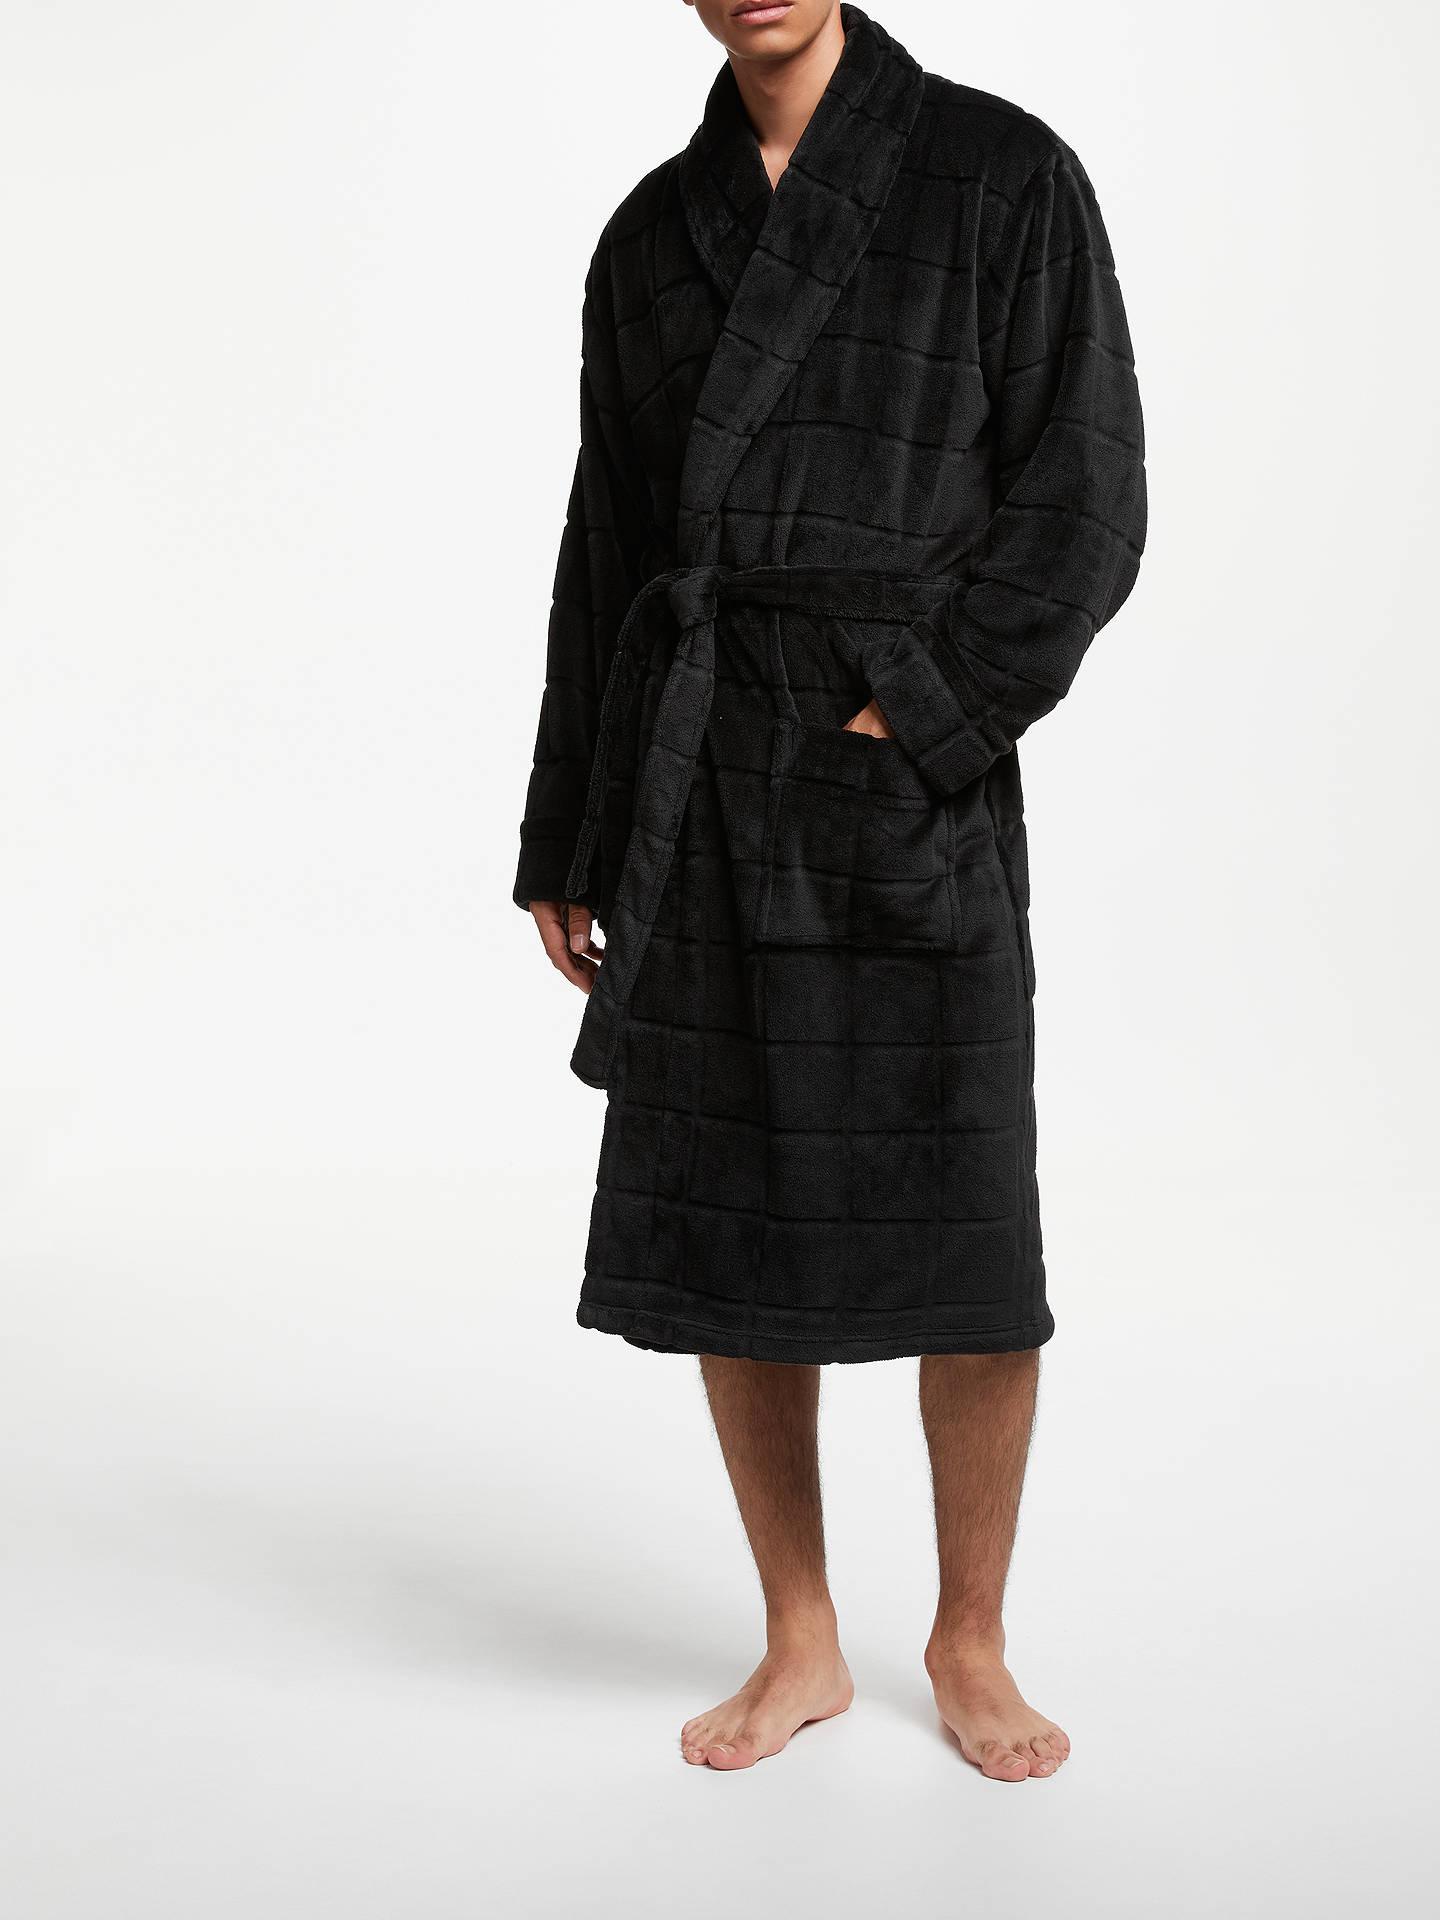 John Lewis Partners Ribbed Fleece Dressing Gown Black At John